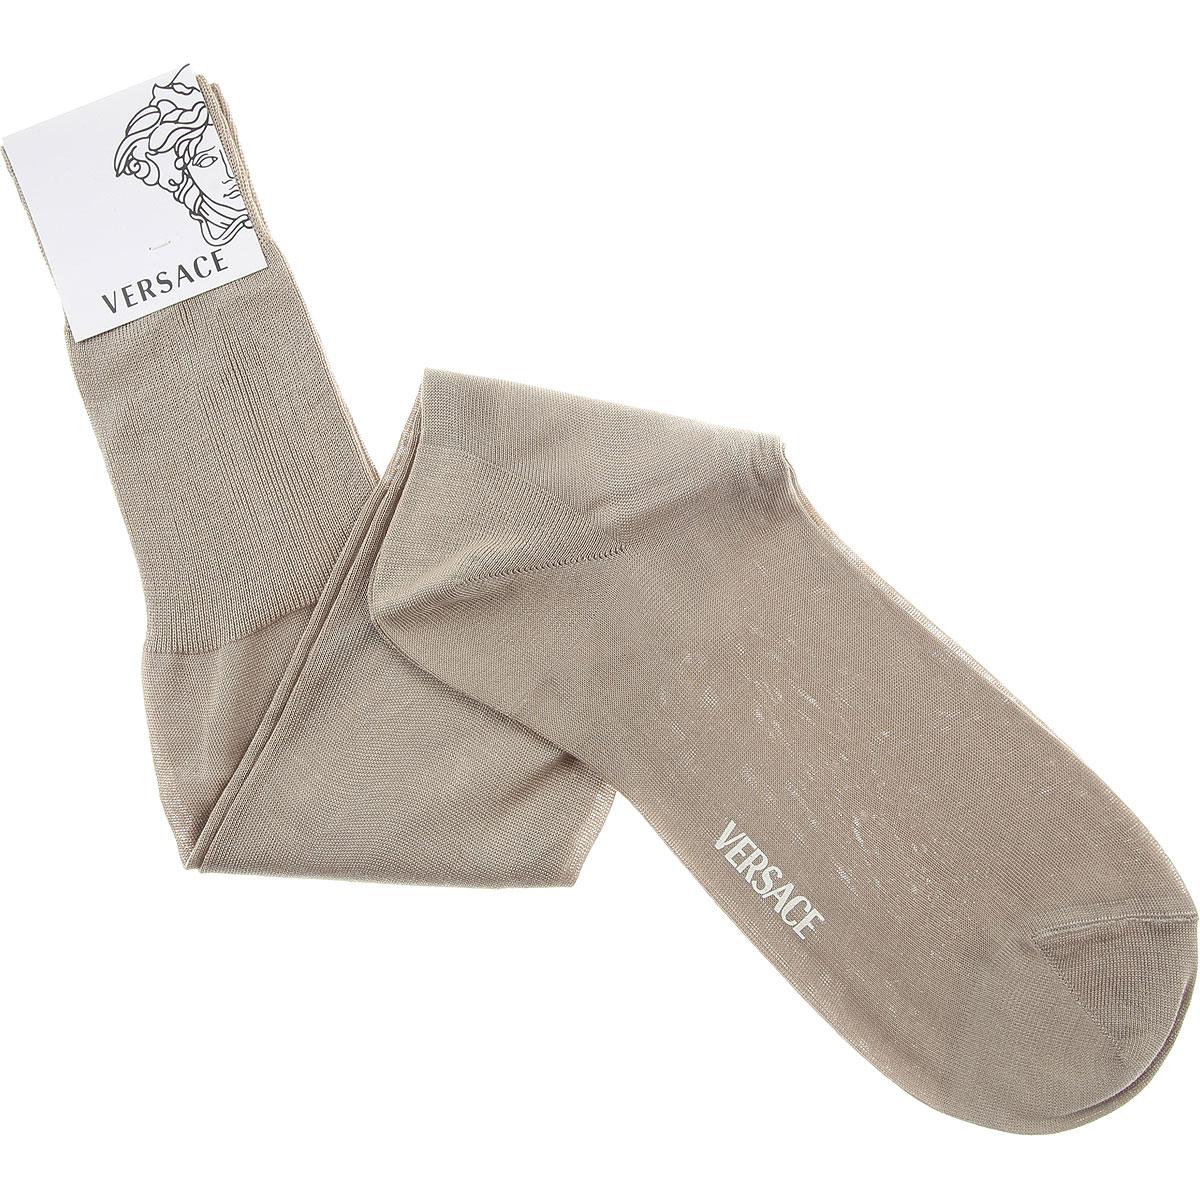 Versace Socks Socks for Men On Sale in Outlet, Mud, Lisle Cotton Thread, 2019, 11.5 (Shoe Size: EU 43.5 - US 9.5) 12 (Shoe Size: EU 44 - US 10)